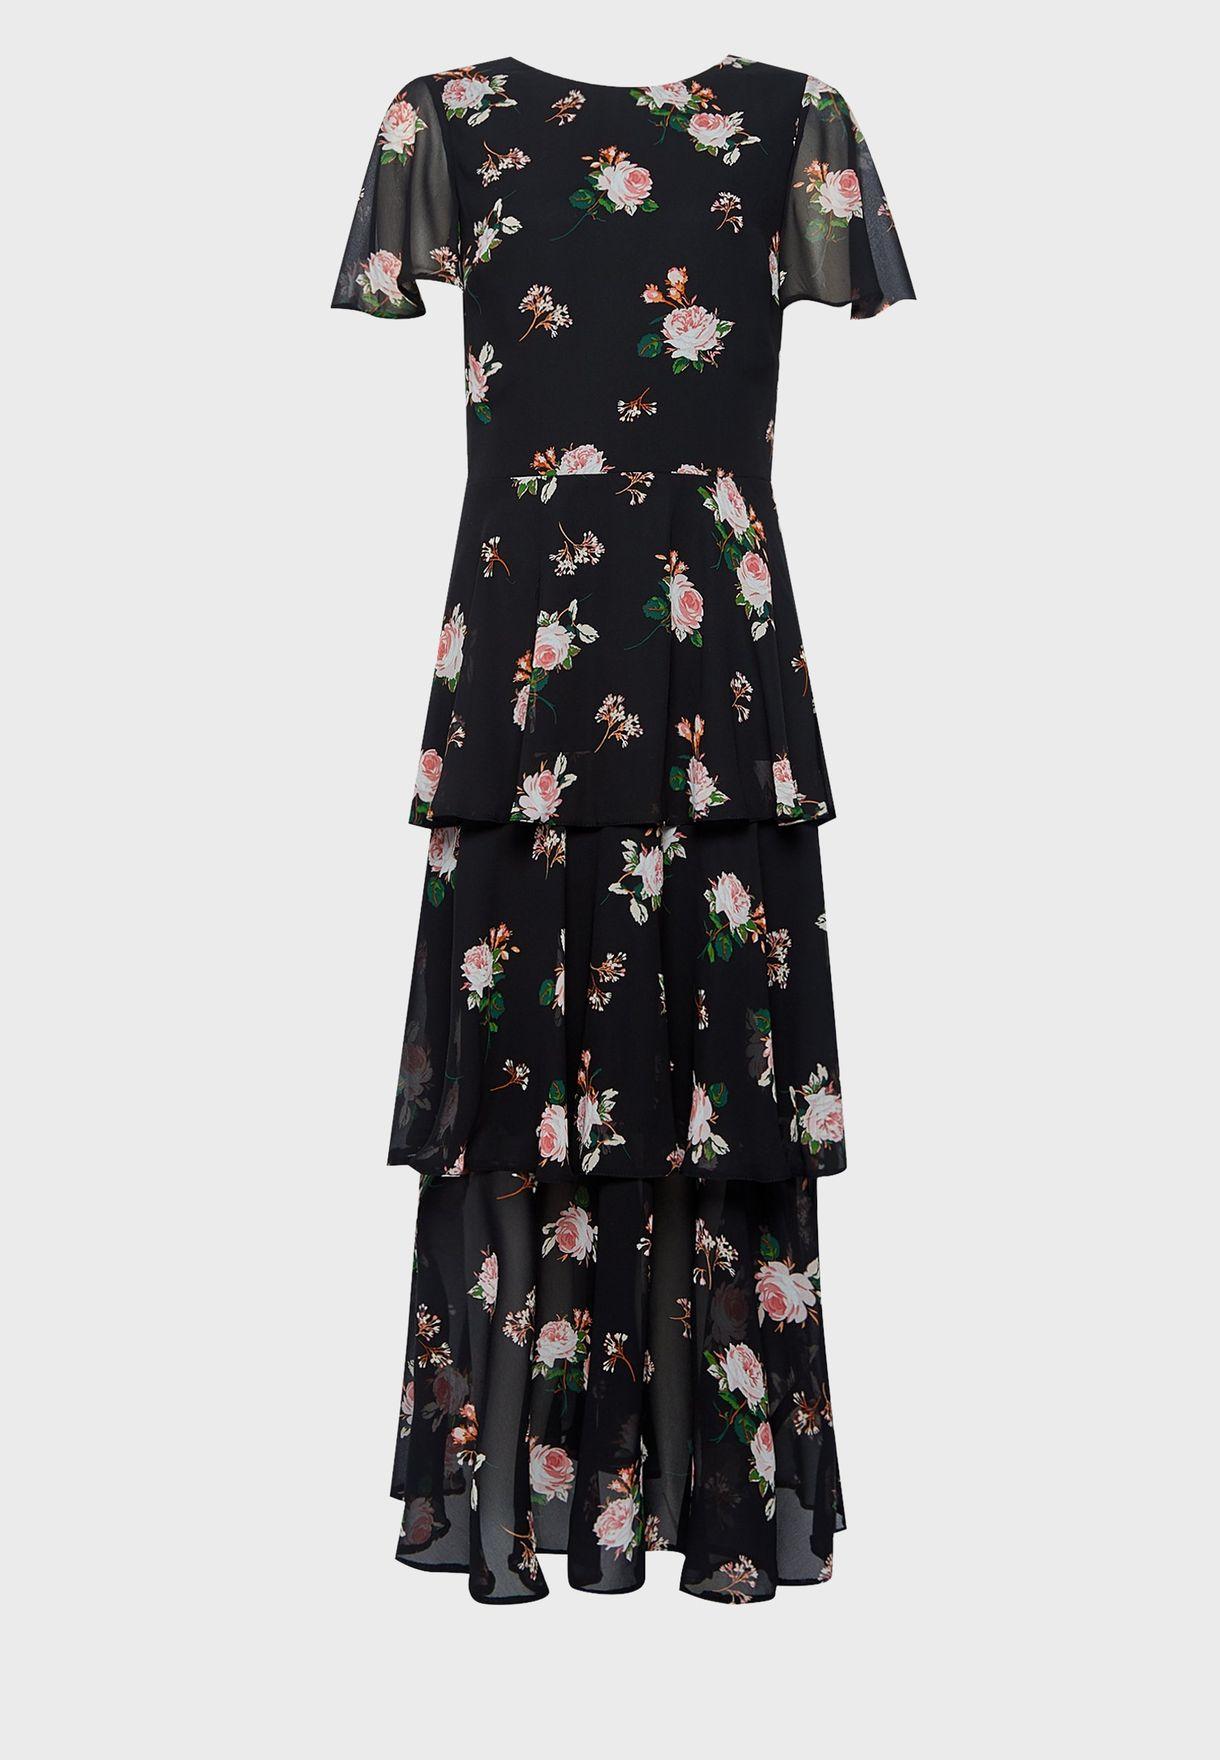 Floral Print Tiered Hem Dress